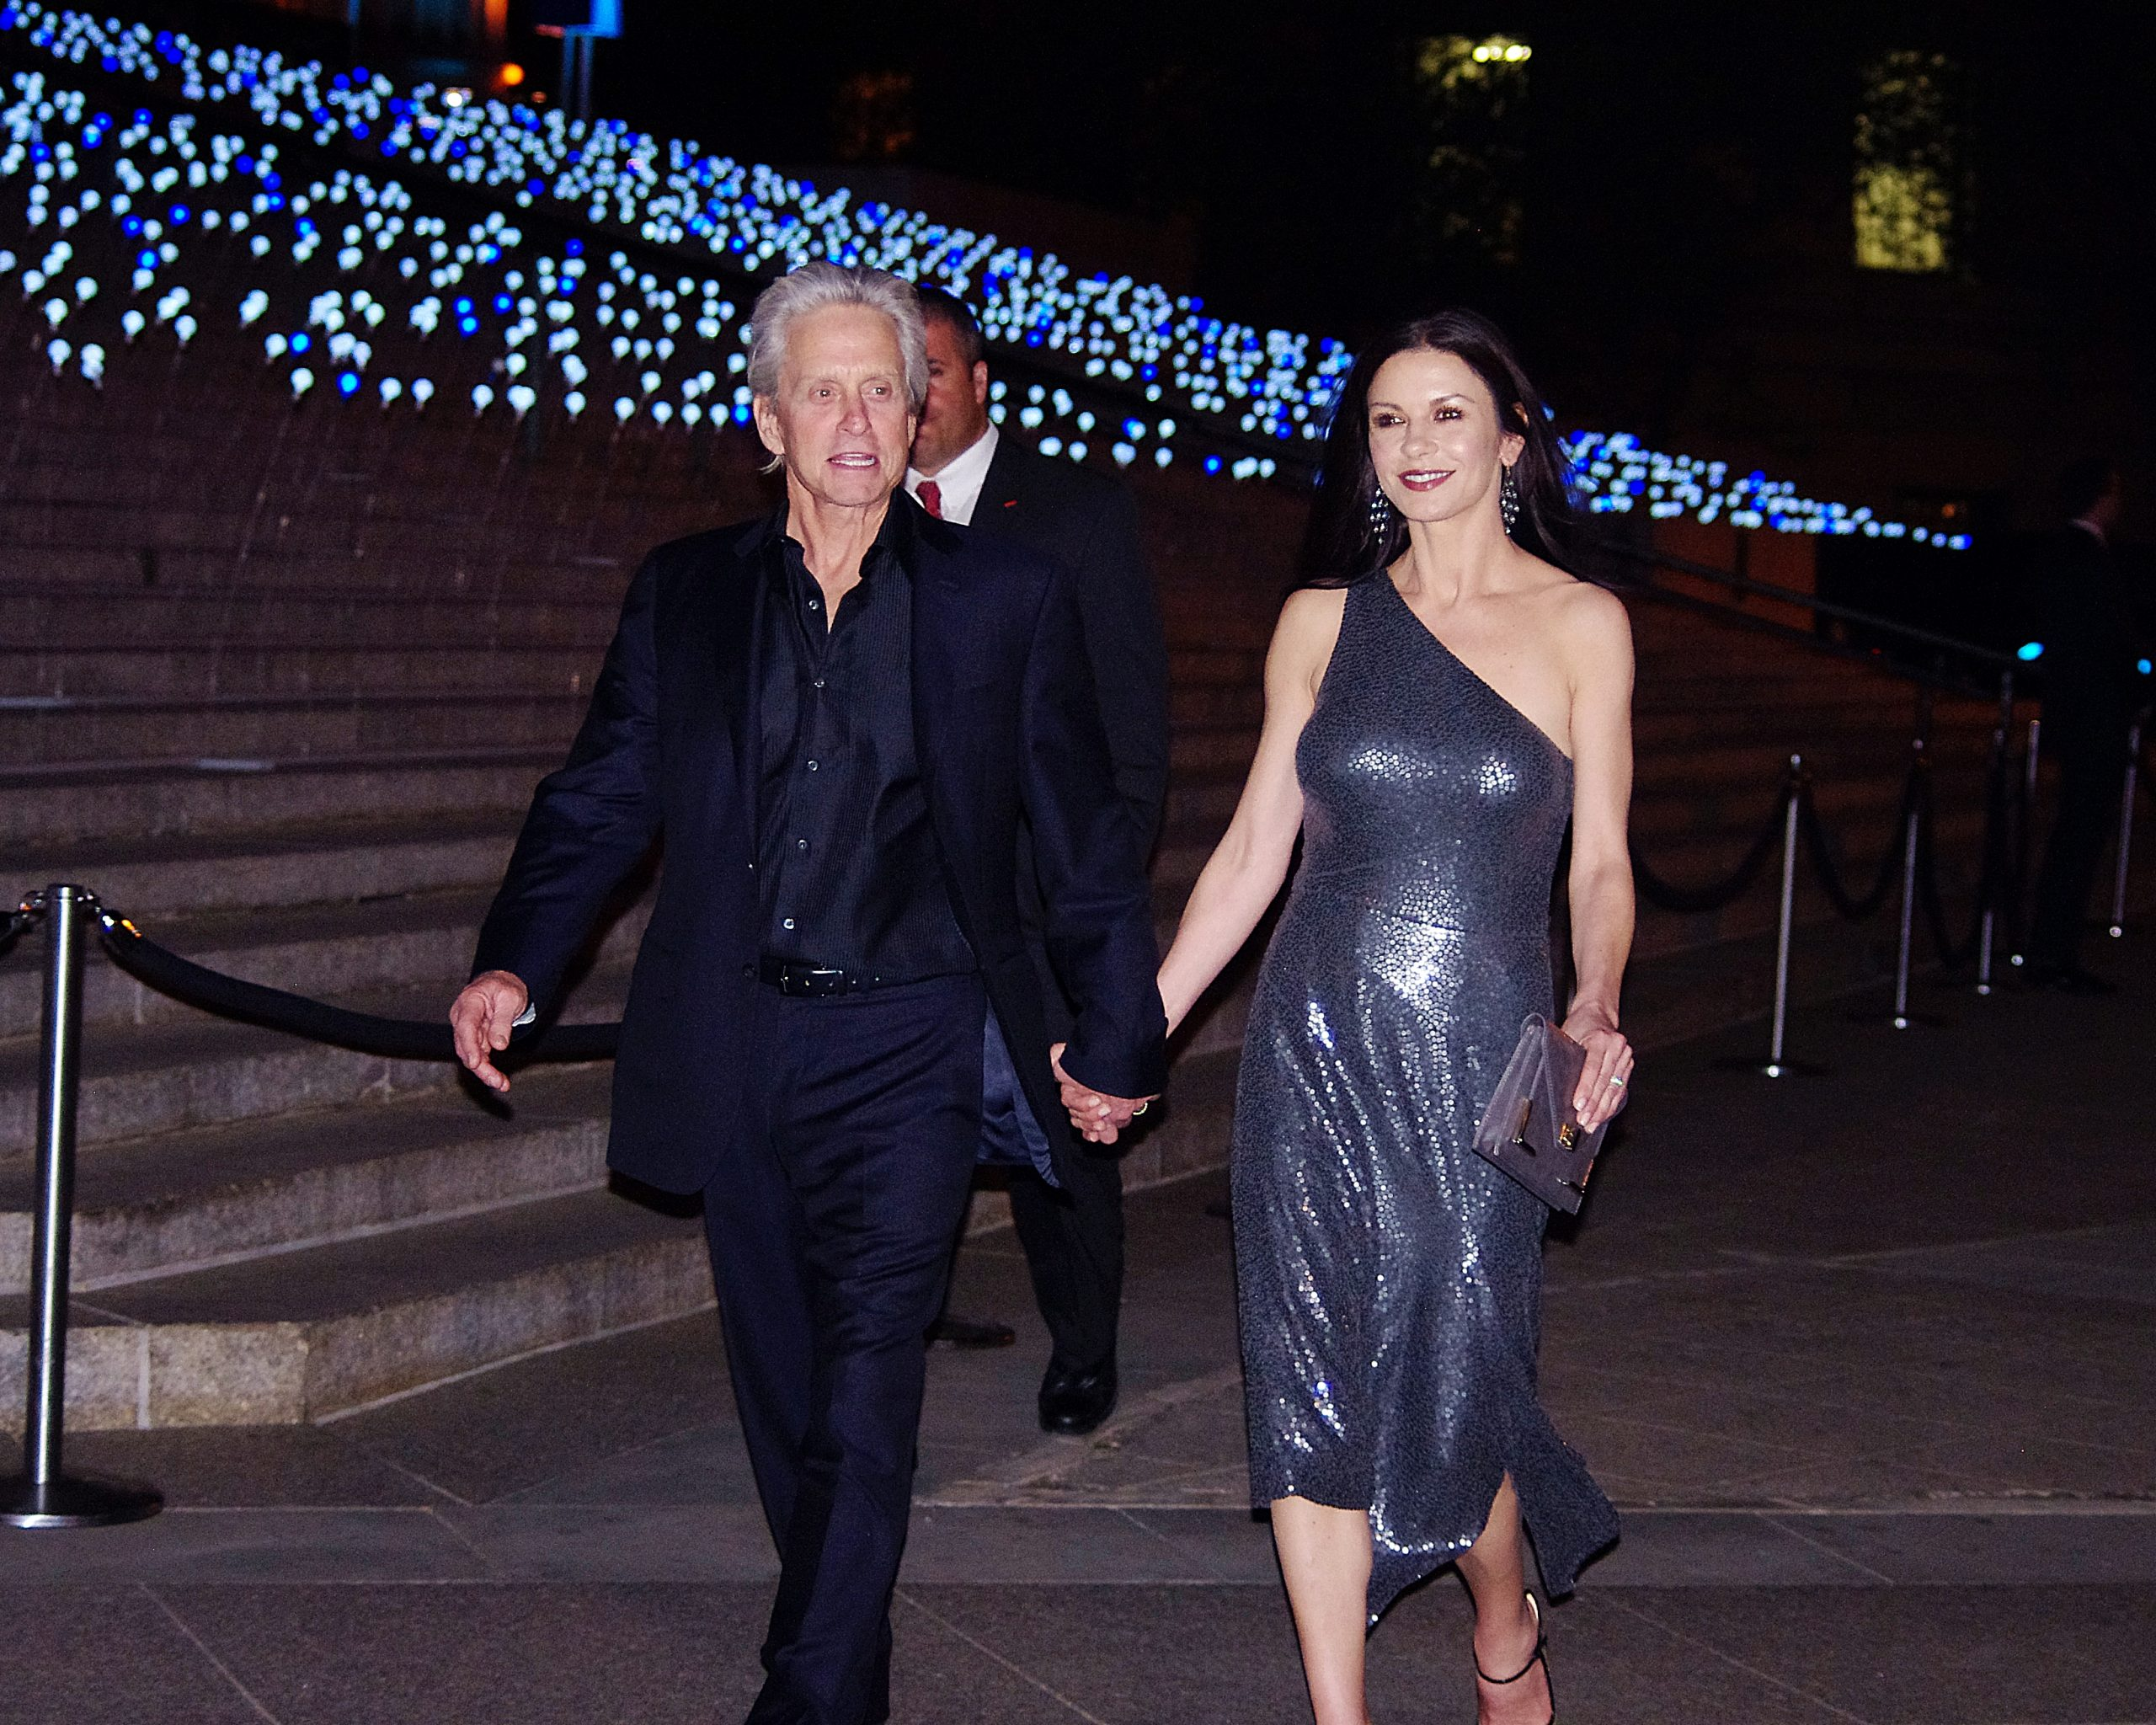 Catherine Zeta Jones Michael Douglas 2012 Shankbone 2 scaled Legendary 80s Actors With Massive Relationship Age Gaps